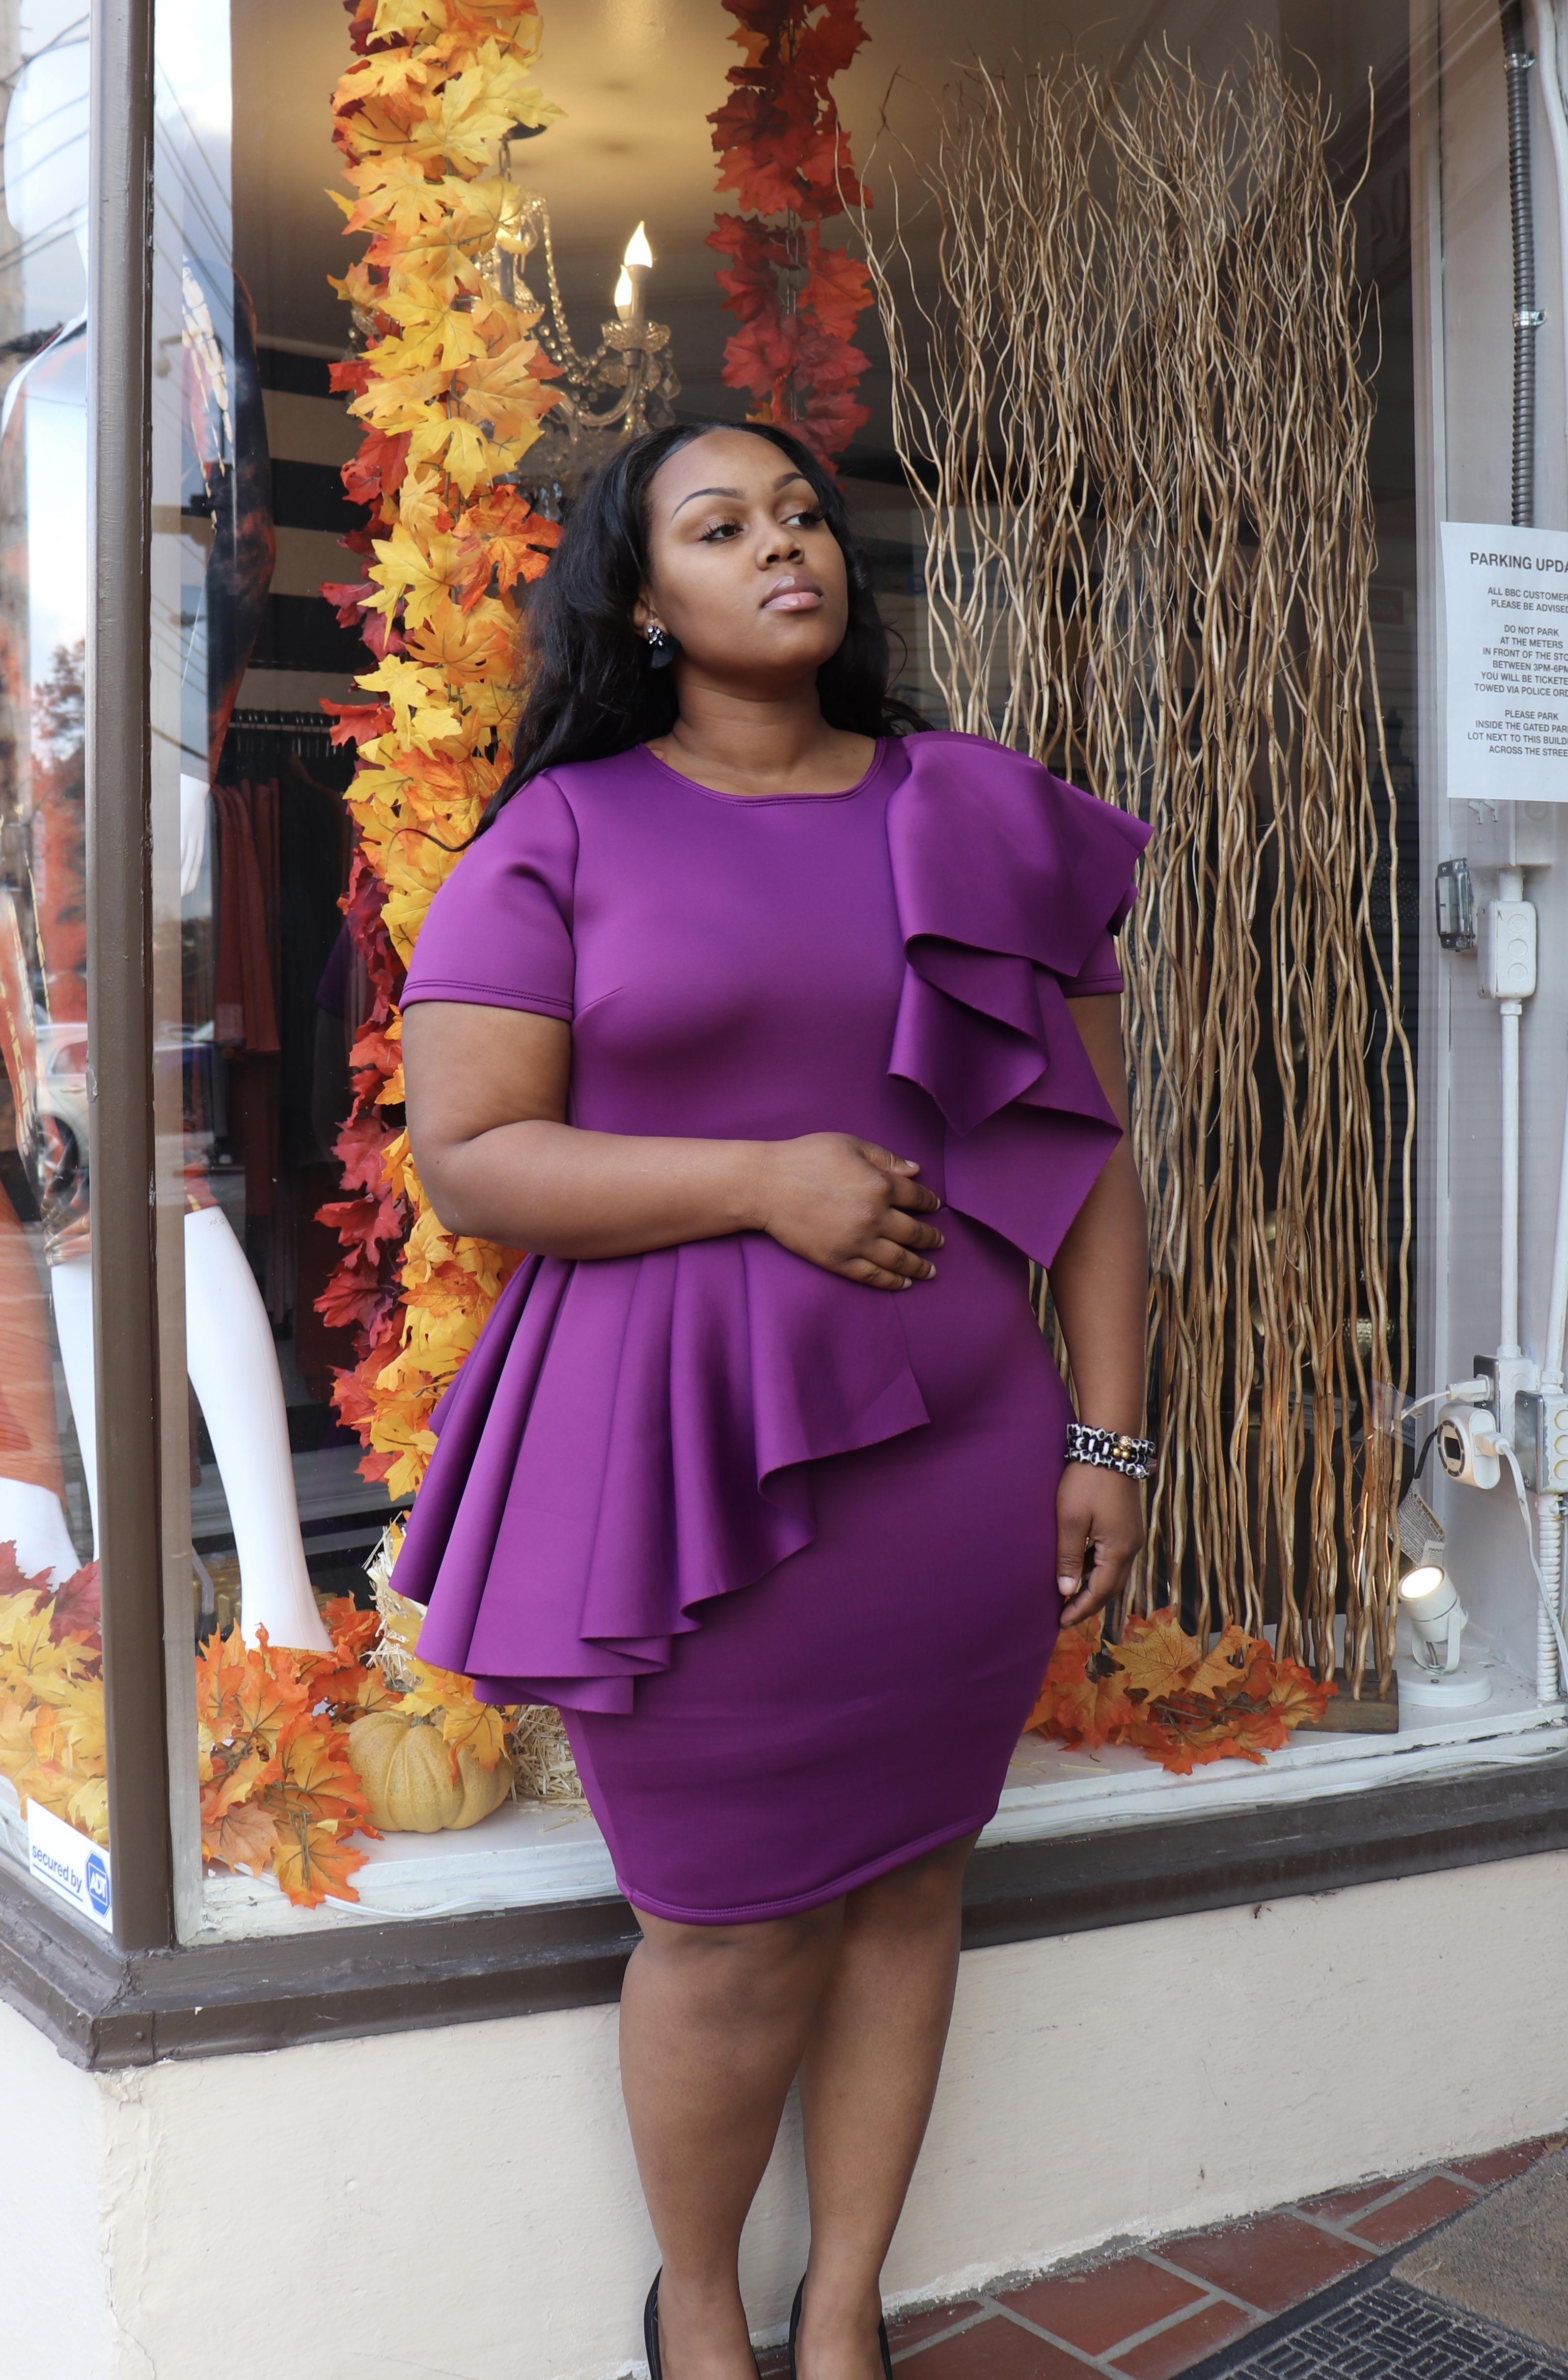 Soraya Peplum Dress UPDR810-SORAYA